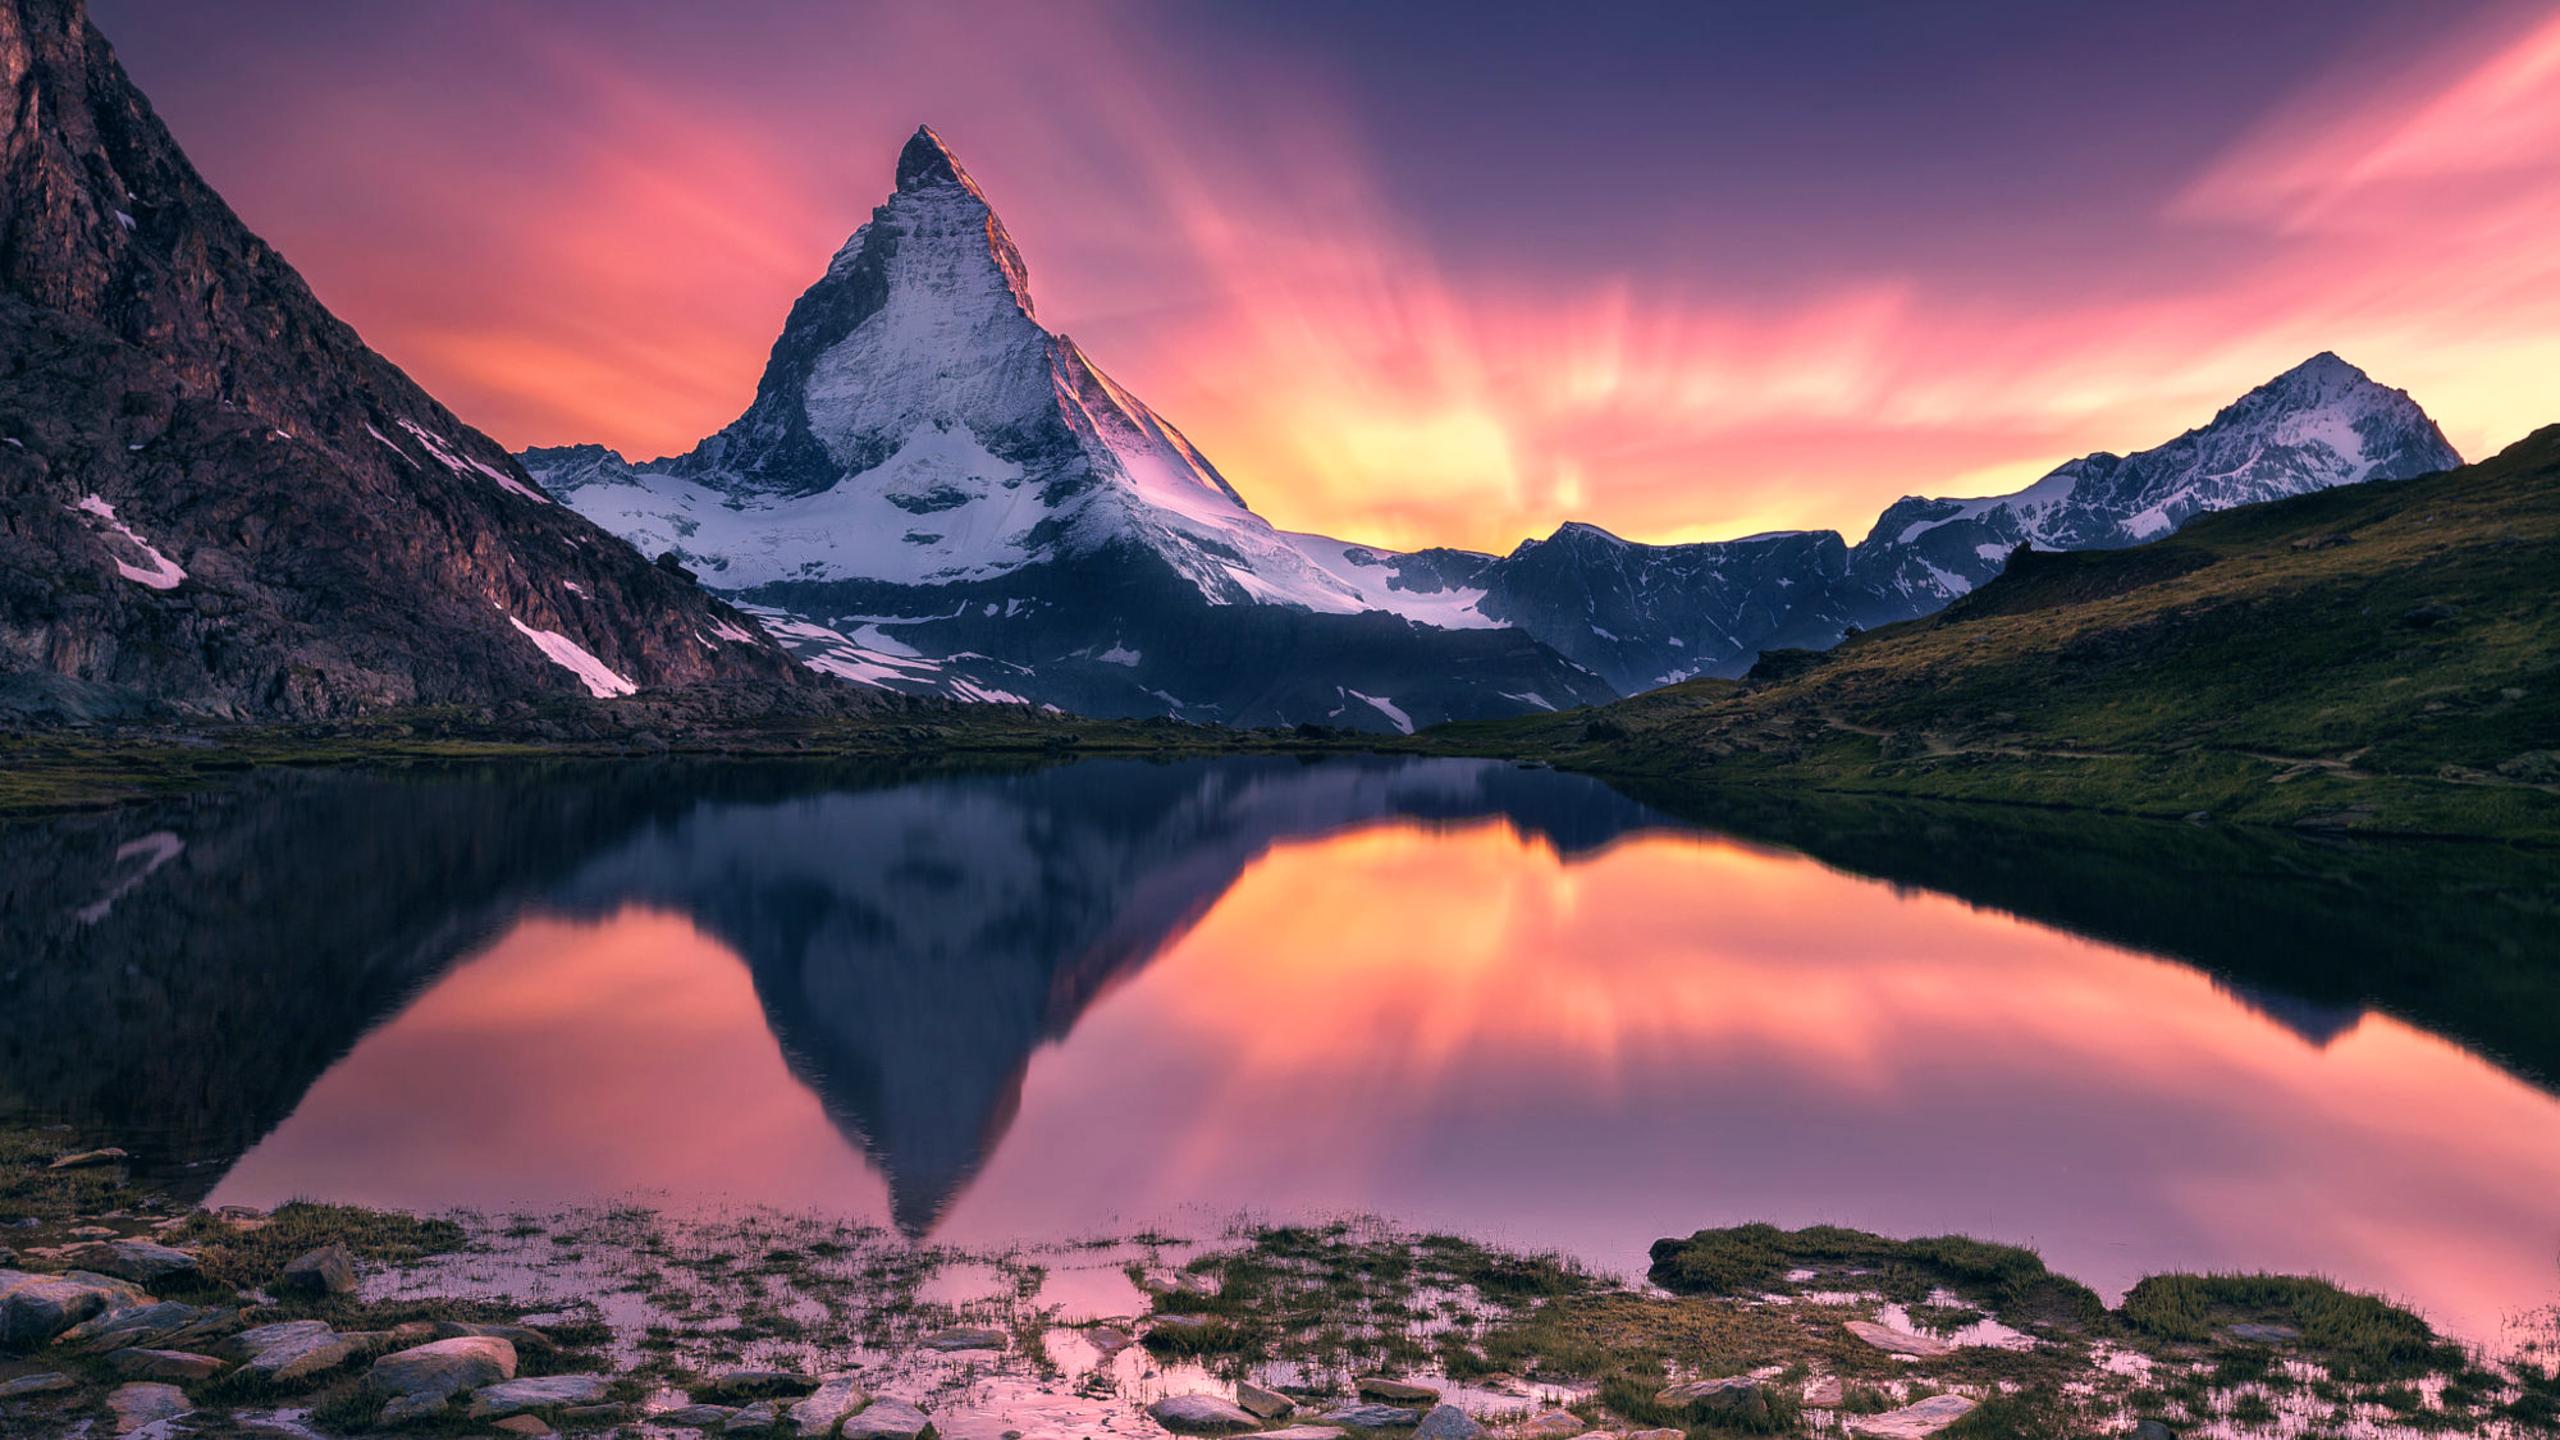 Great Wallpaper Mountain 1440p - matterhorn-mountains-ap-2560x1440  Snapshot_4590100.jpg